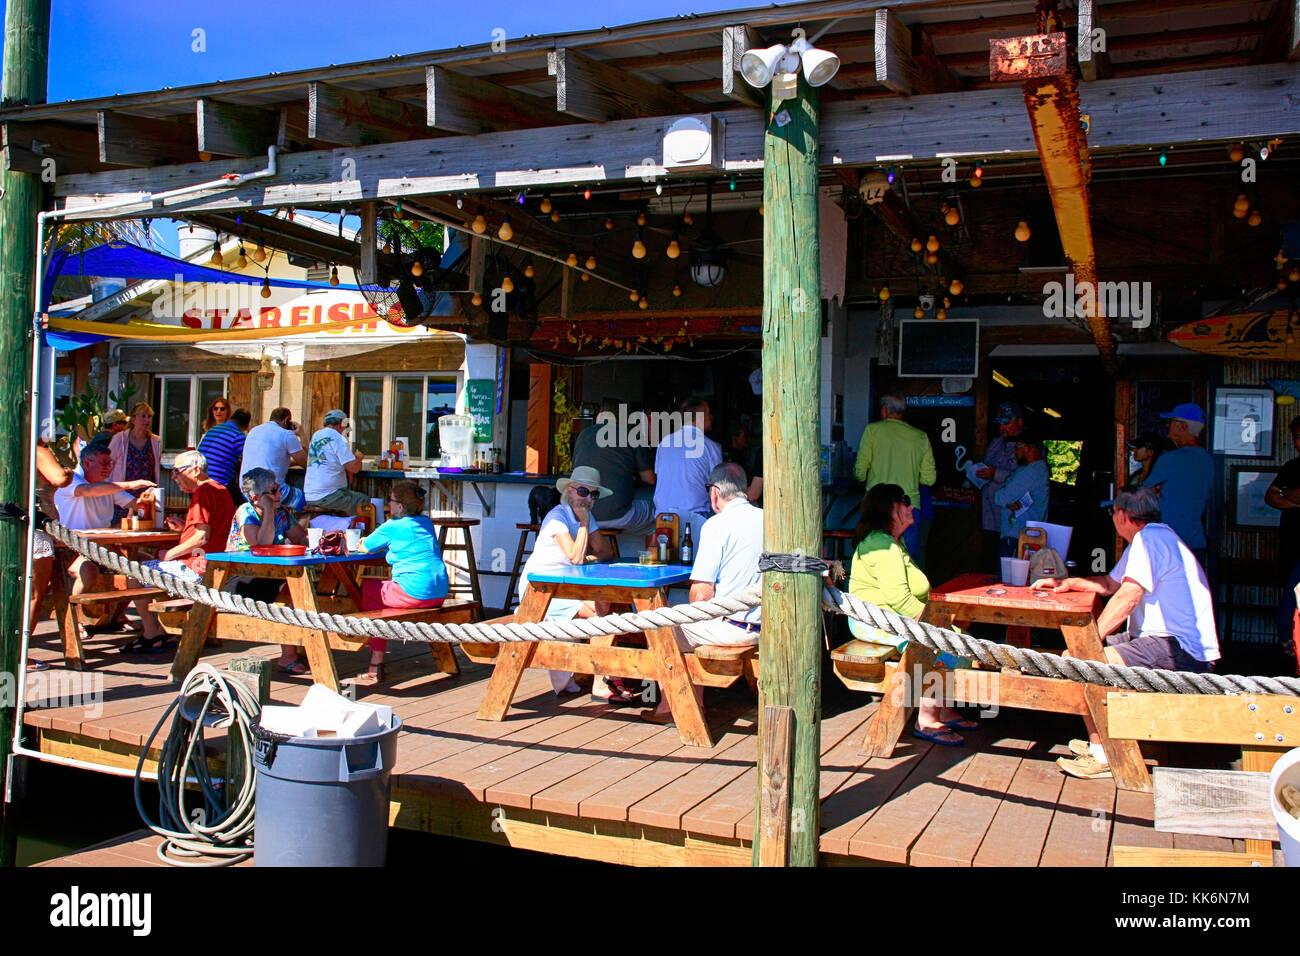 People Enjoying Lunch At The Starfish Company Fish